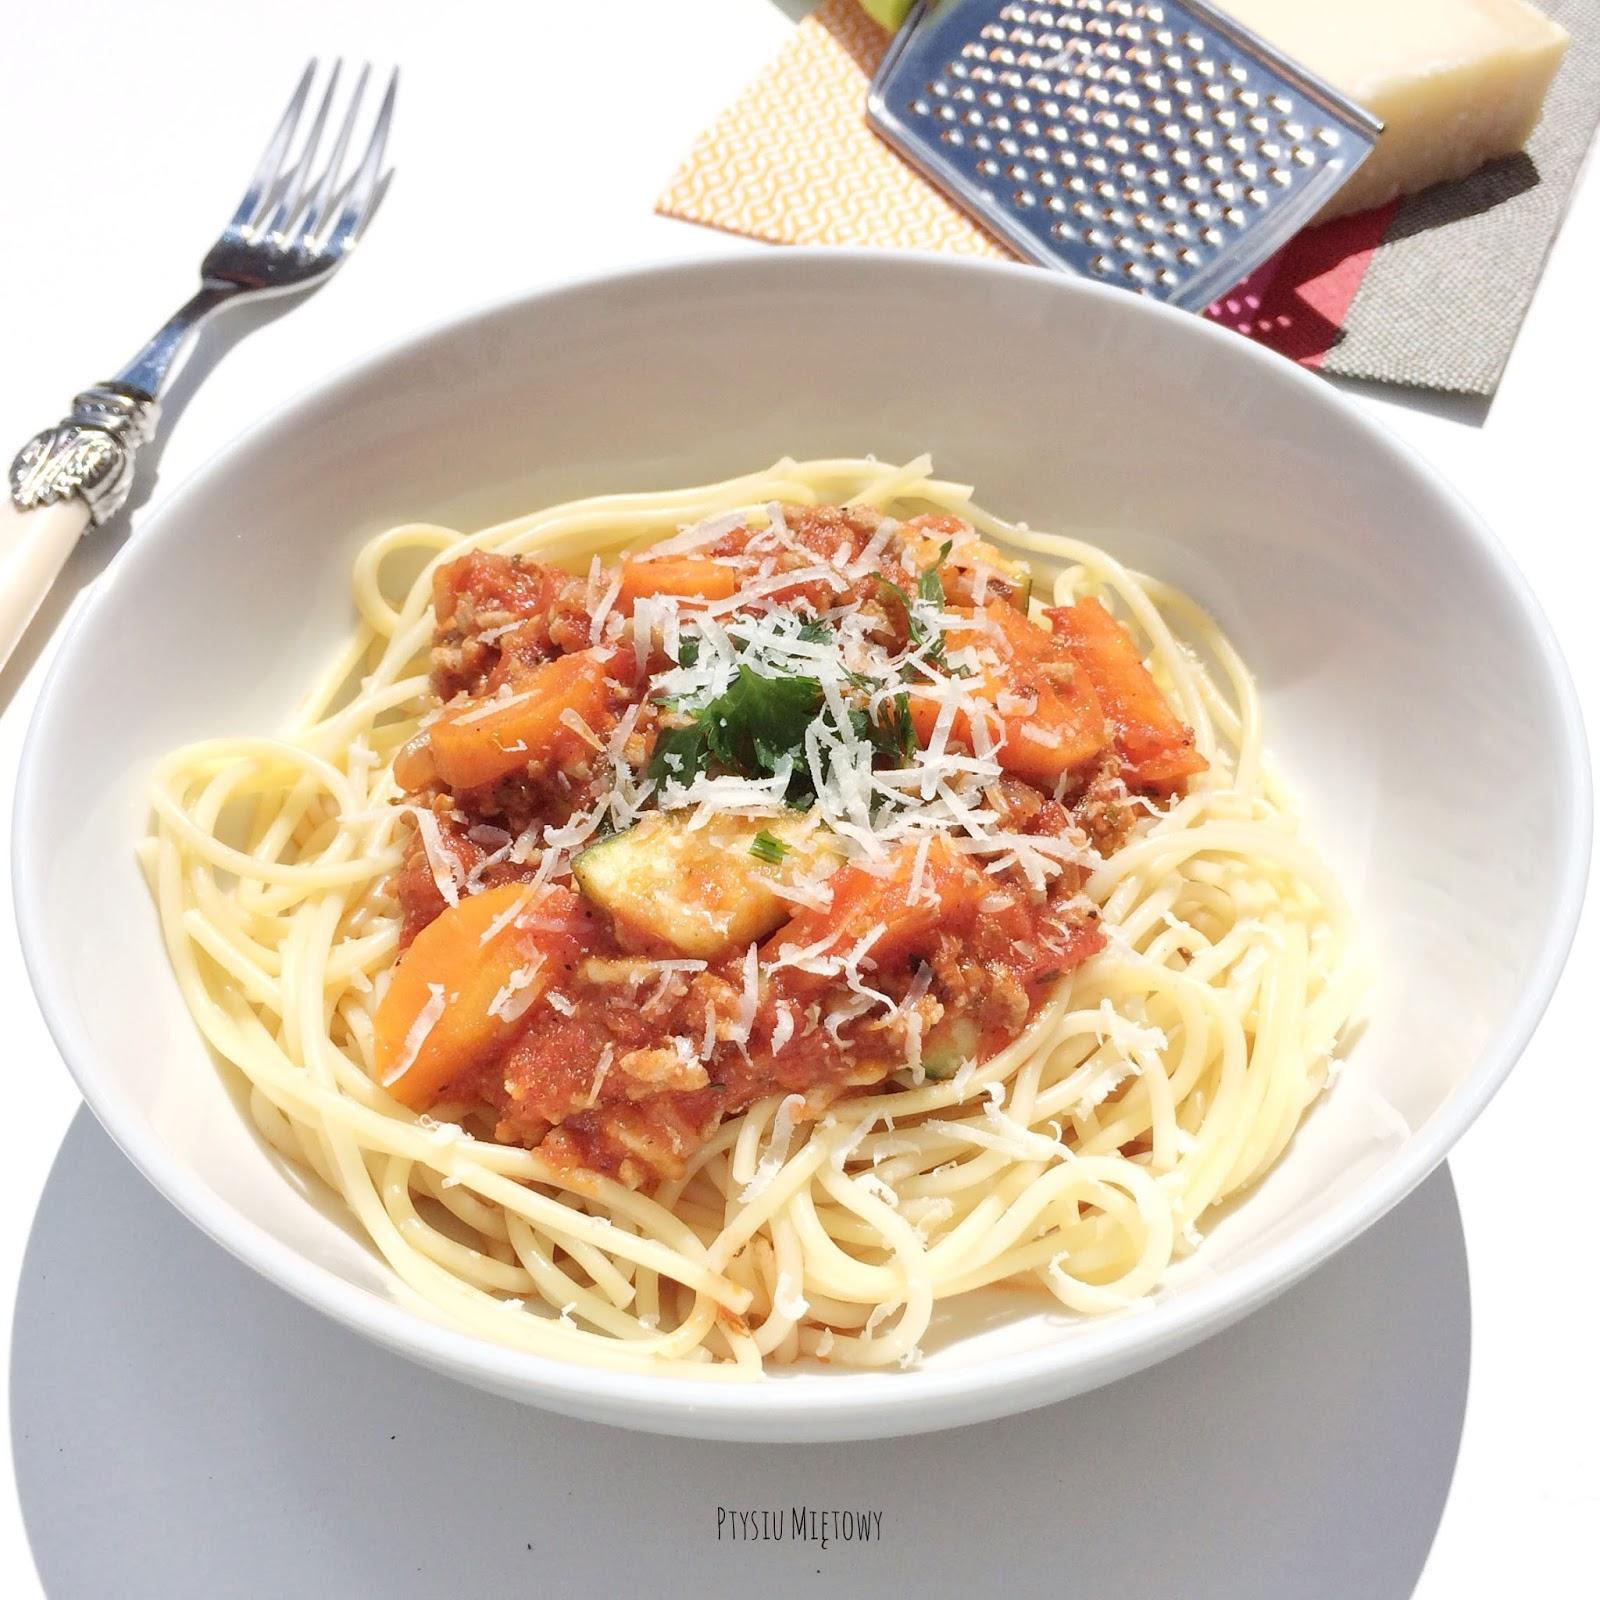 spaghetti bolognese, ptysiu mietowy